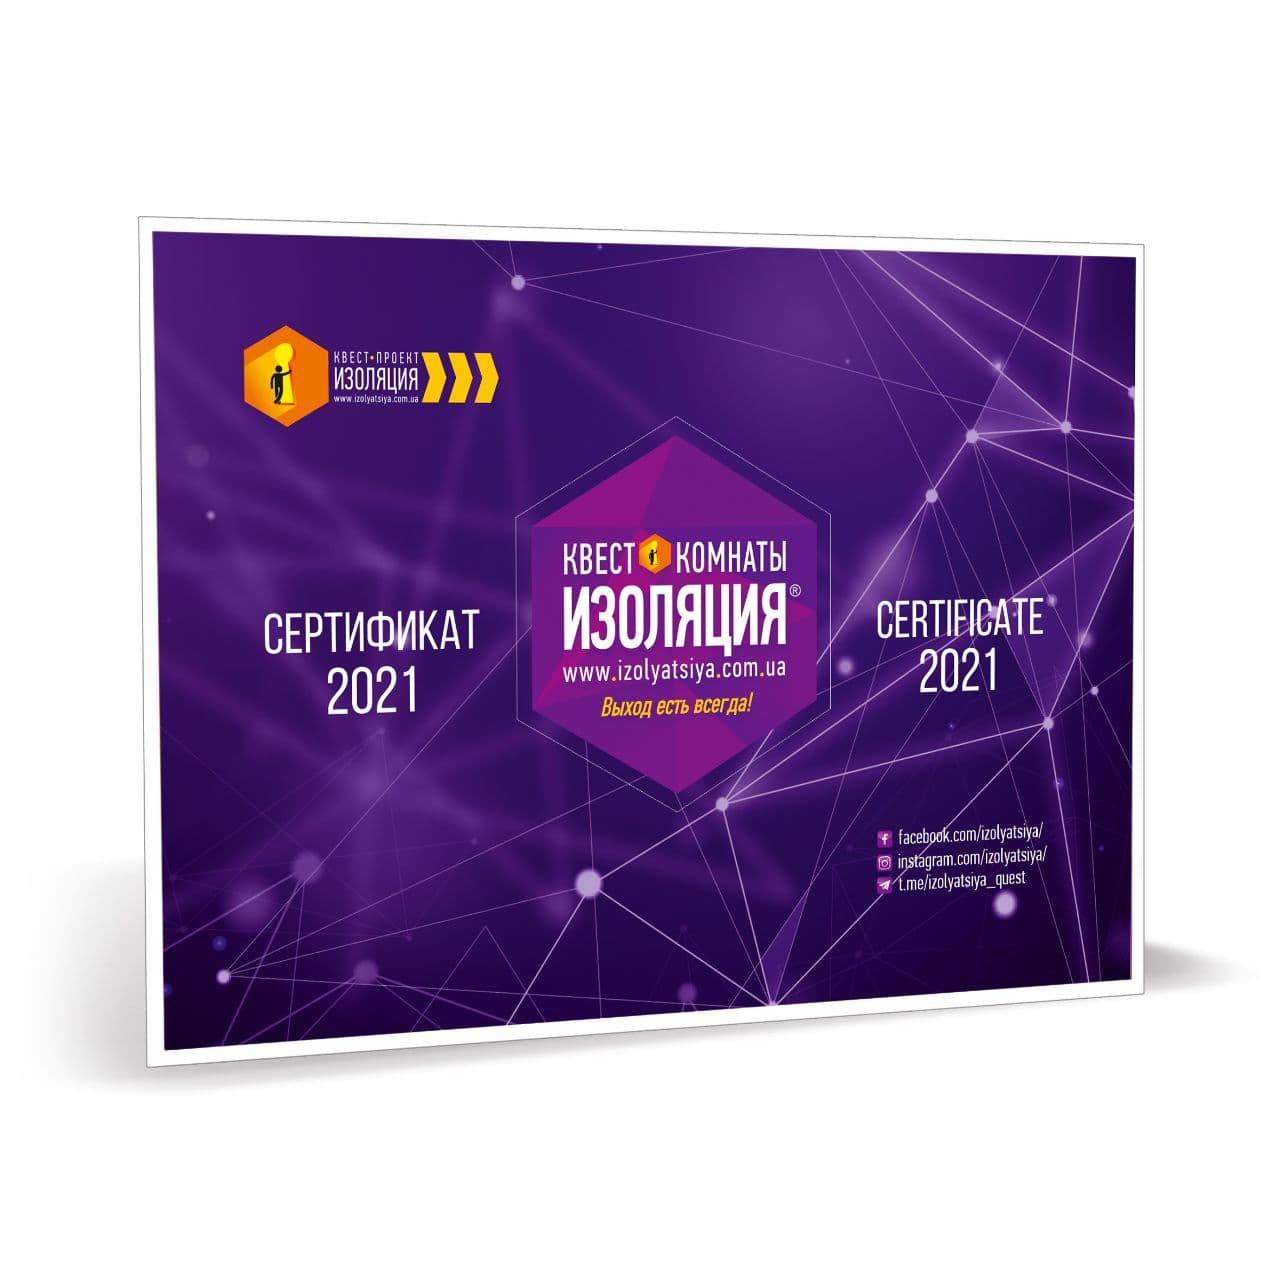 photo_2020-12-21_10-28-42 Сертифікат